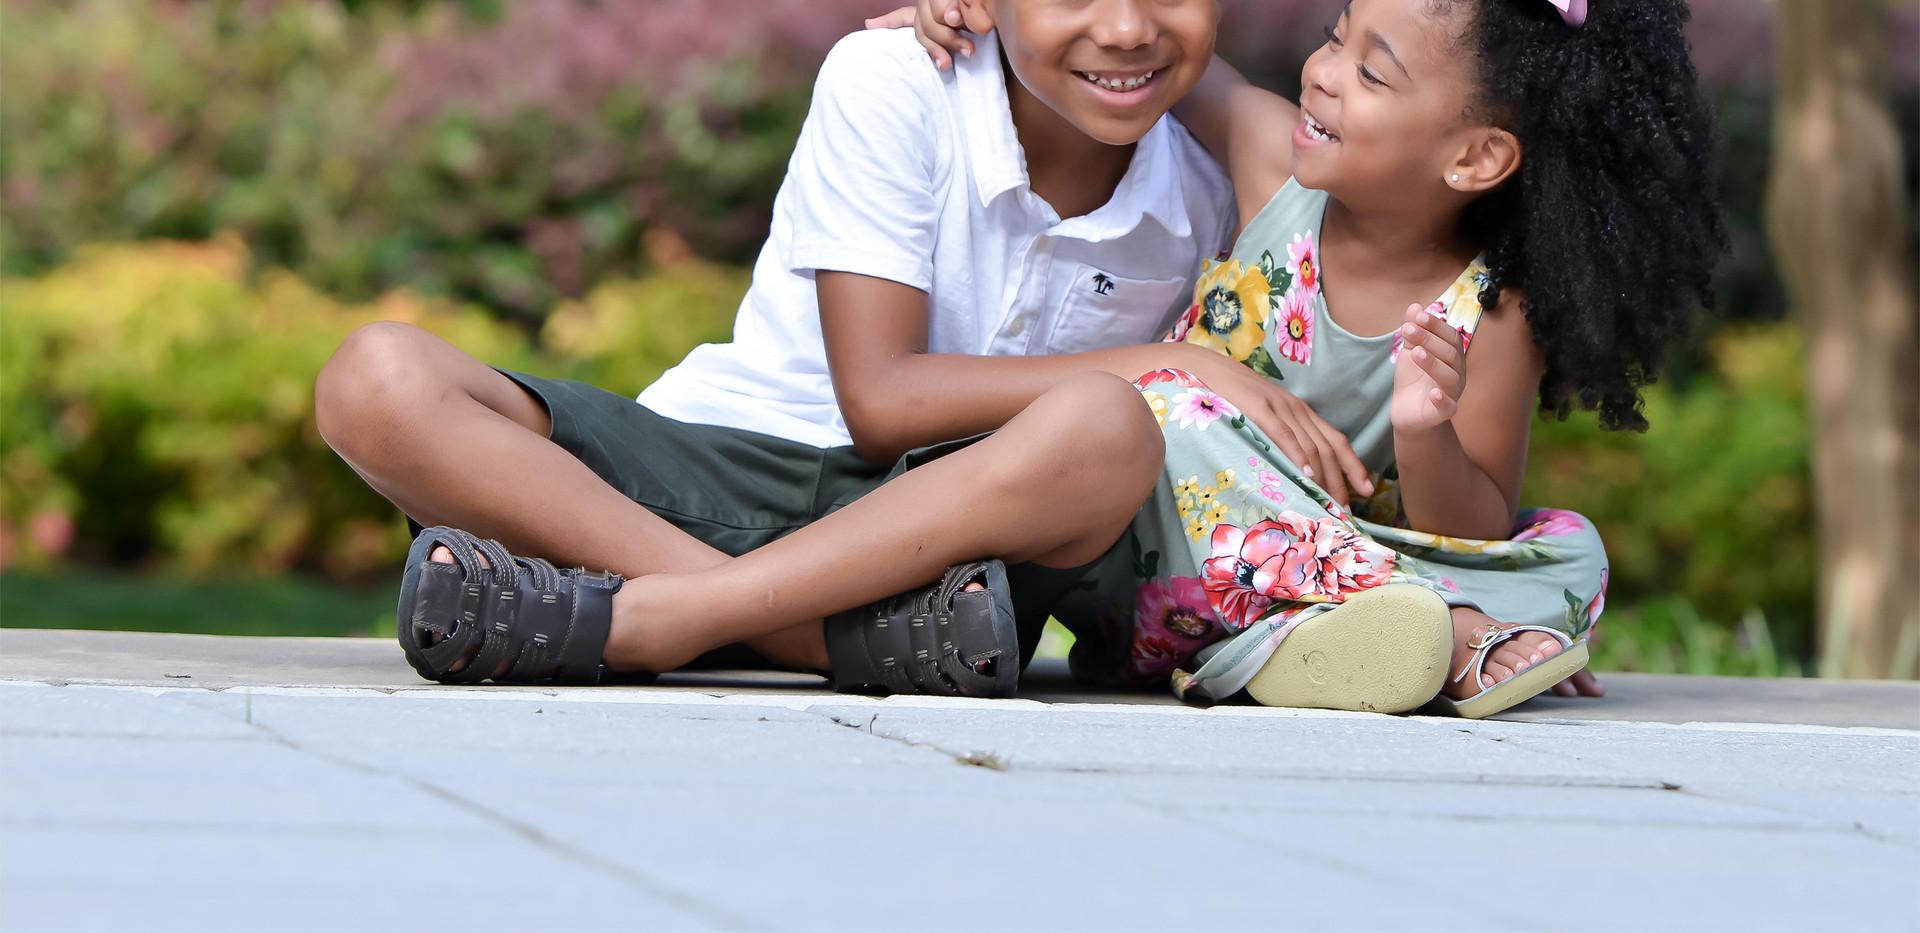 Little Jordan and Bridget